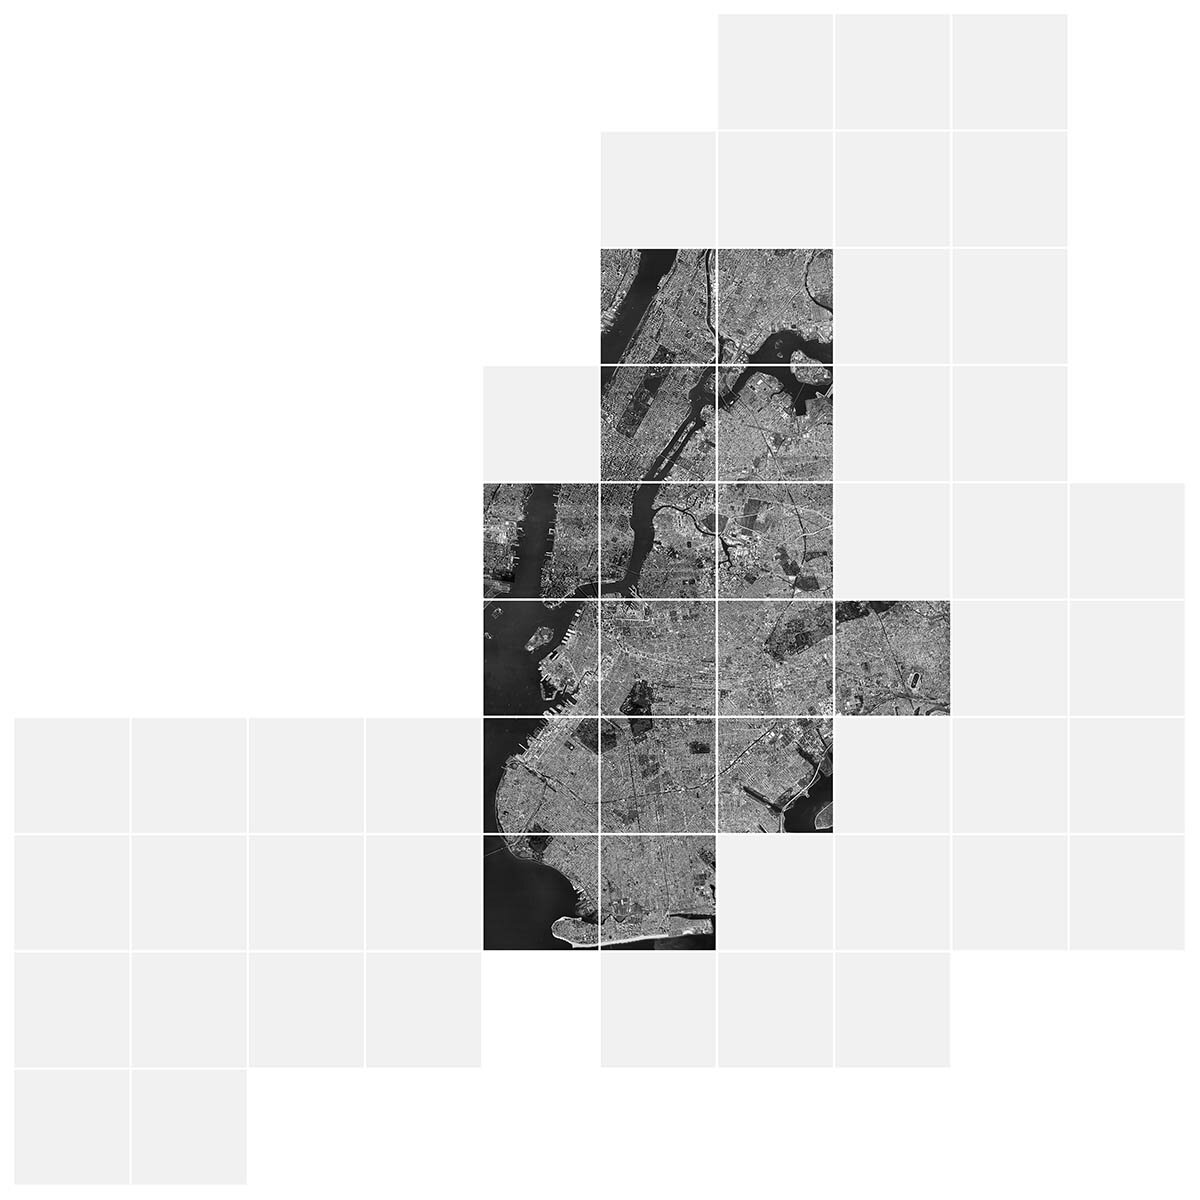 Tracking_09_24_19.jpg